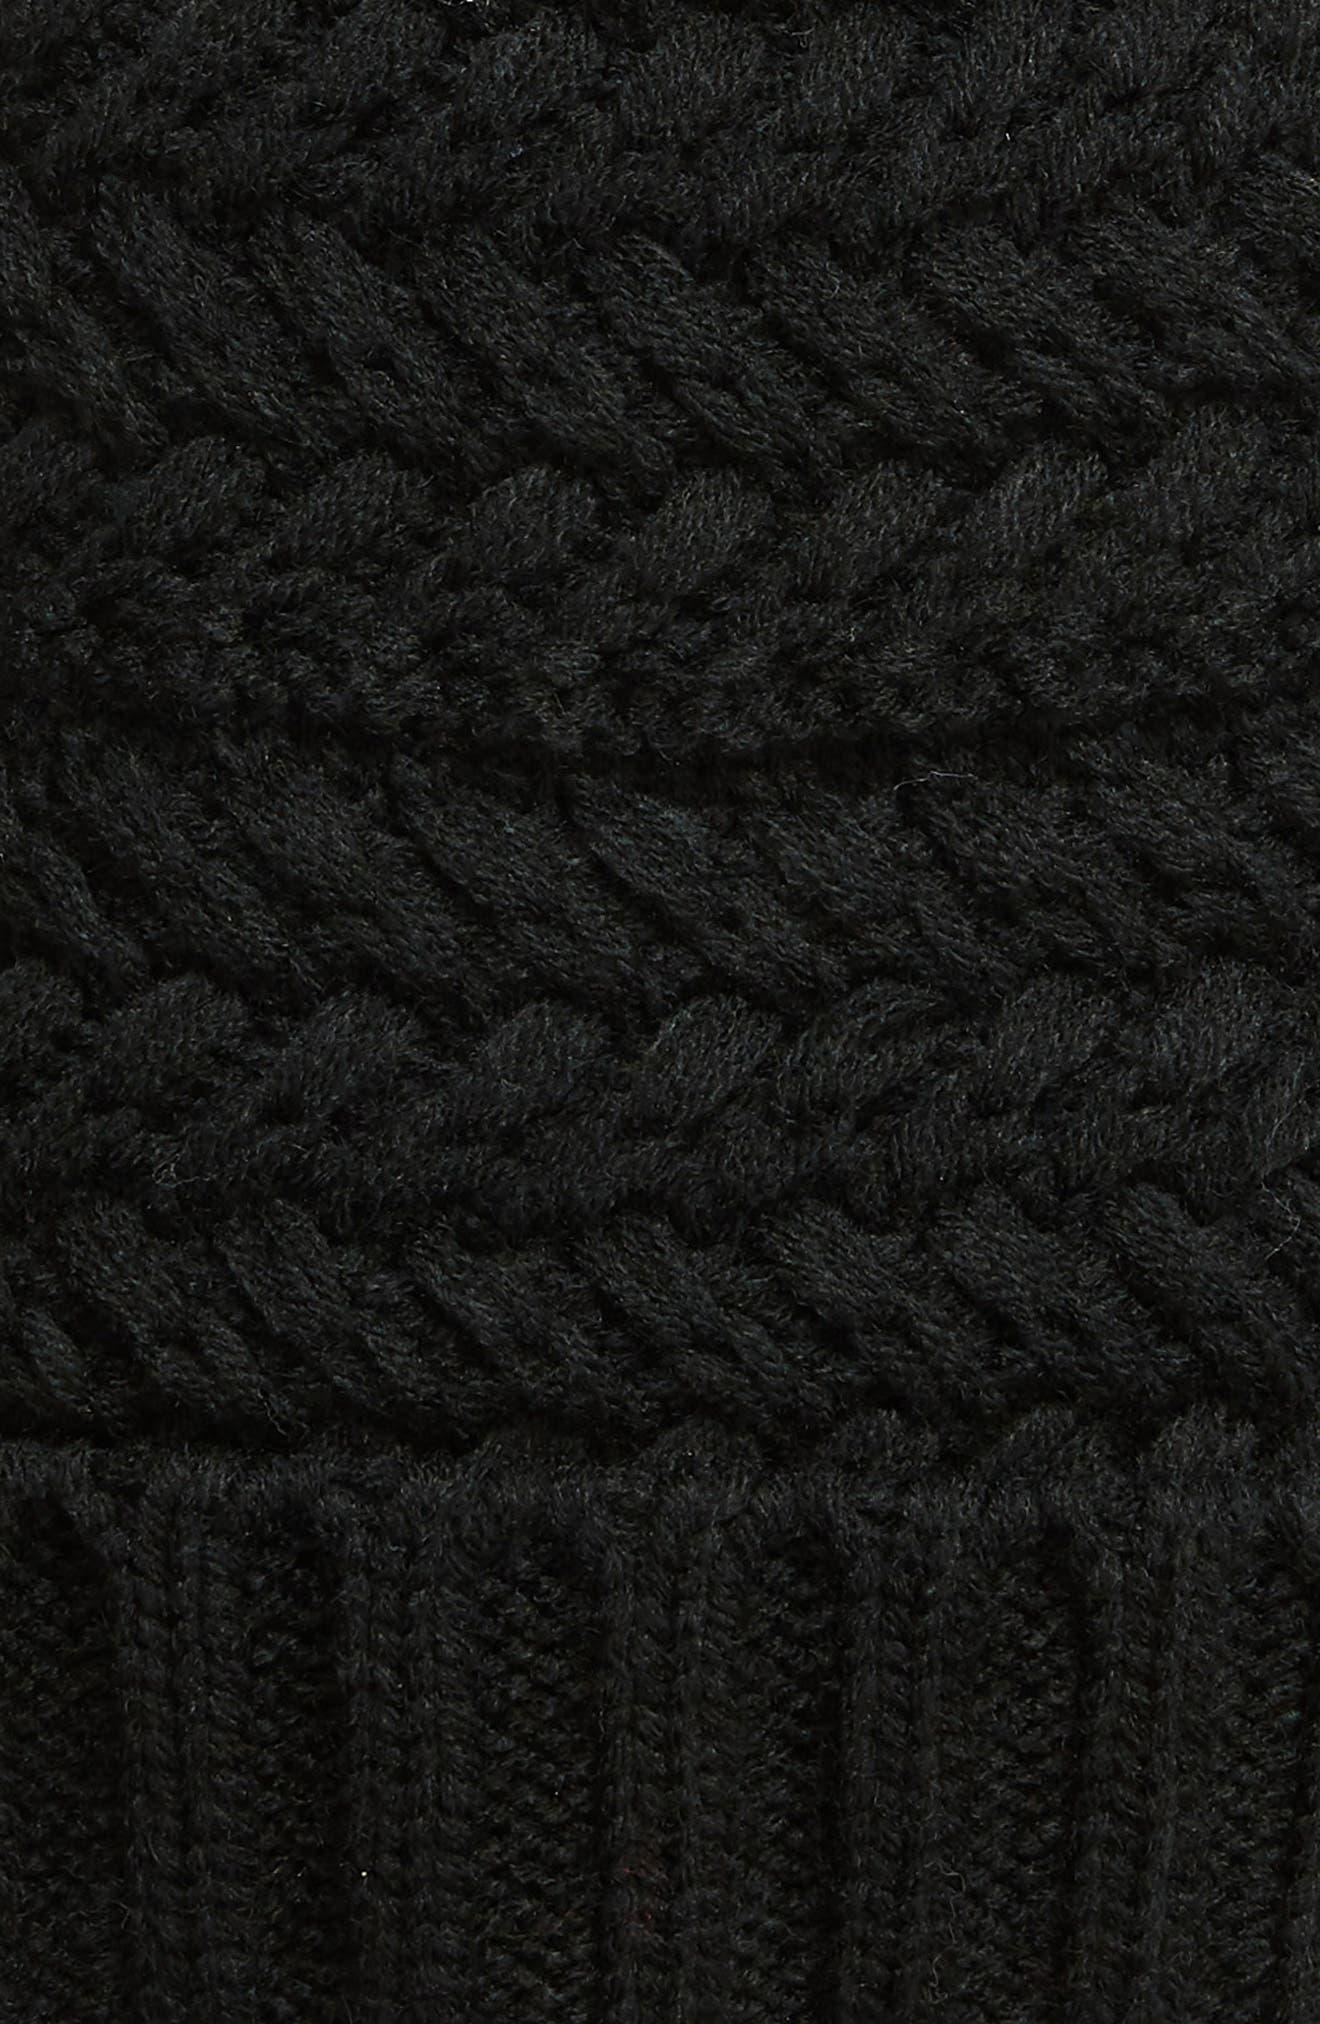 Cable Knit Beanie with Faux Fur Pom,                             Alternate thumbnail 2, color,                             BLACK